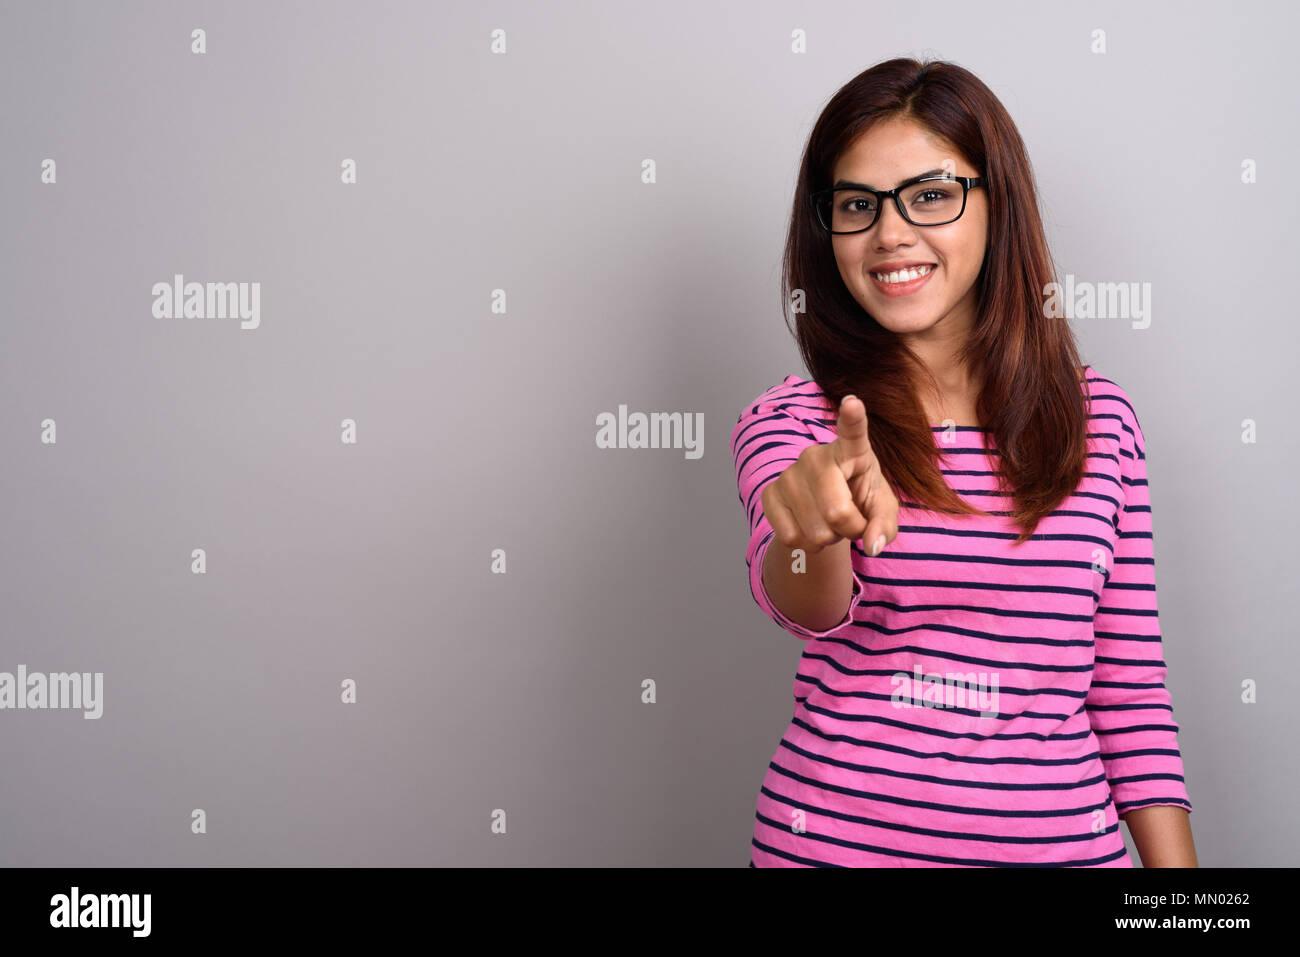 beautiful indian girl wearing glasses stock photos & beautiful